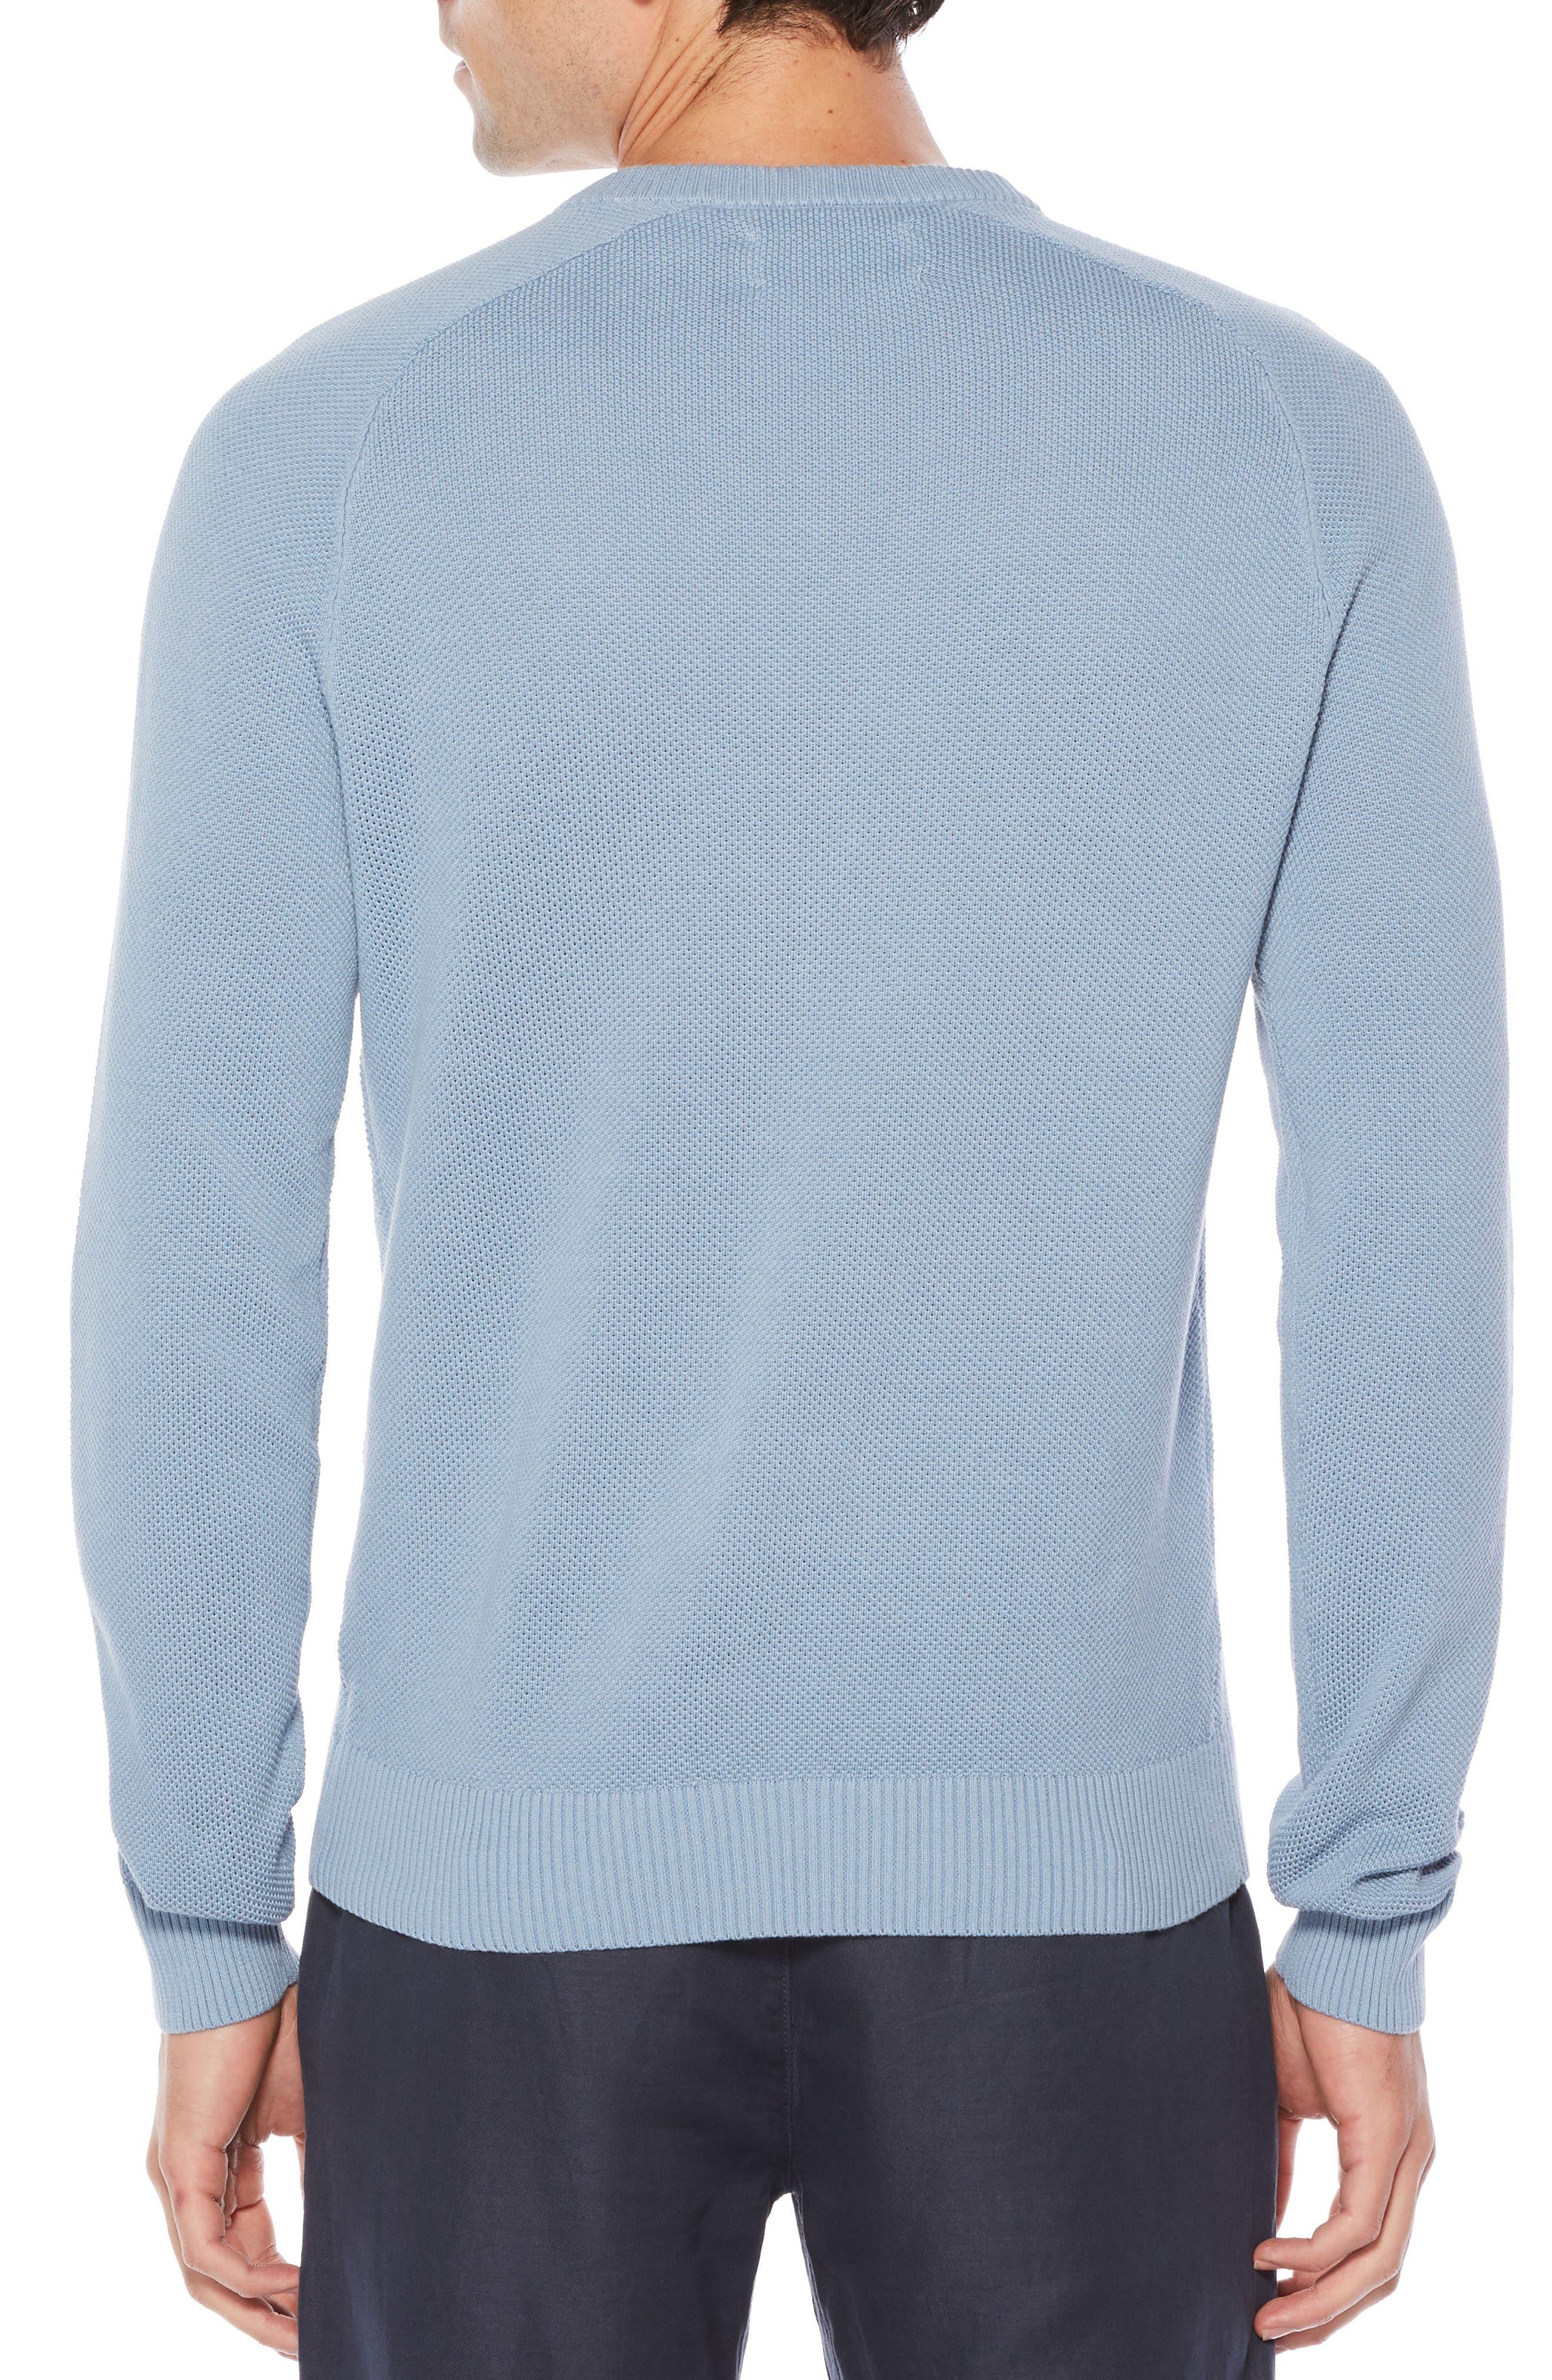 Piqué V-Neck Sweater,                             Alternate thumbnail 2, color,                             Steel Grey